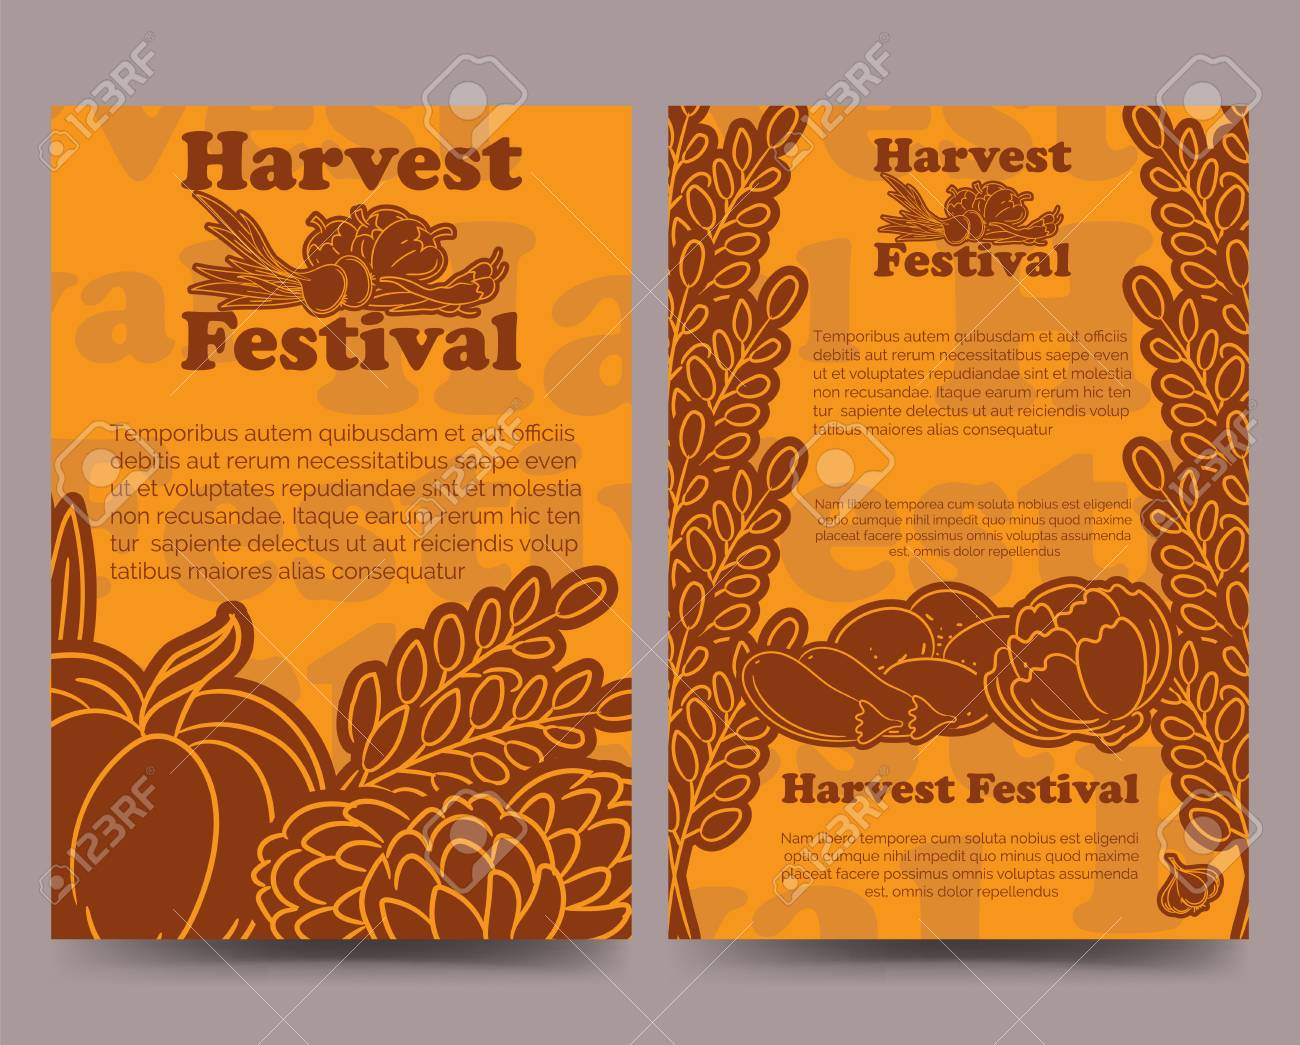 harvest festival brochure flyer template with lined vegetables vector illustration stock vector 63748891